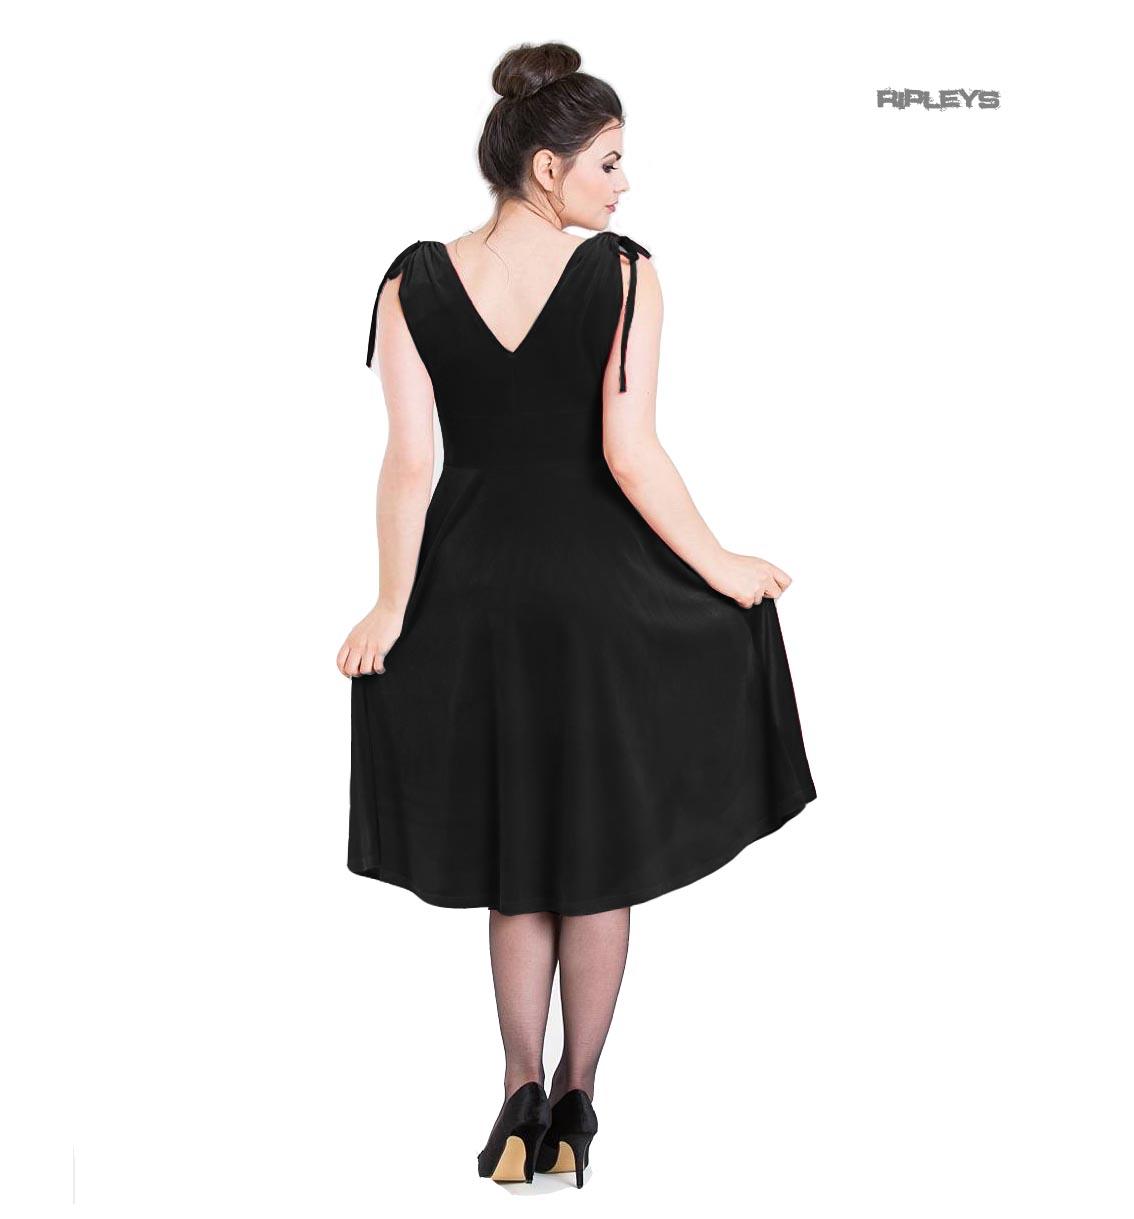 Hell-Bunny-40s-50s-Elegant-Pin-Up-Dress-MELINA-Crushed-Velvet-Black-All-Sizes thumbnail 24